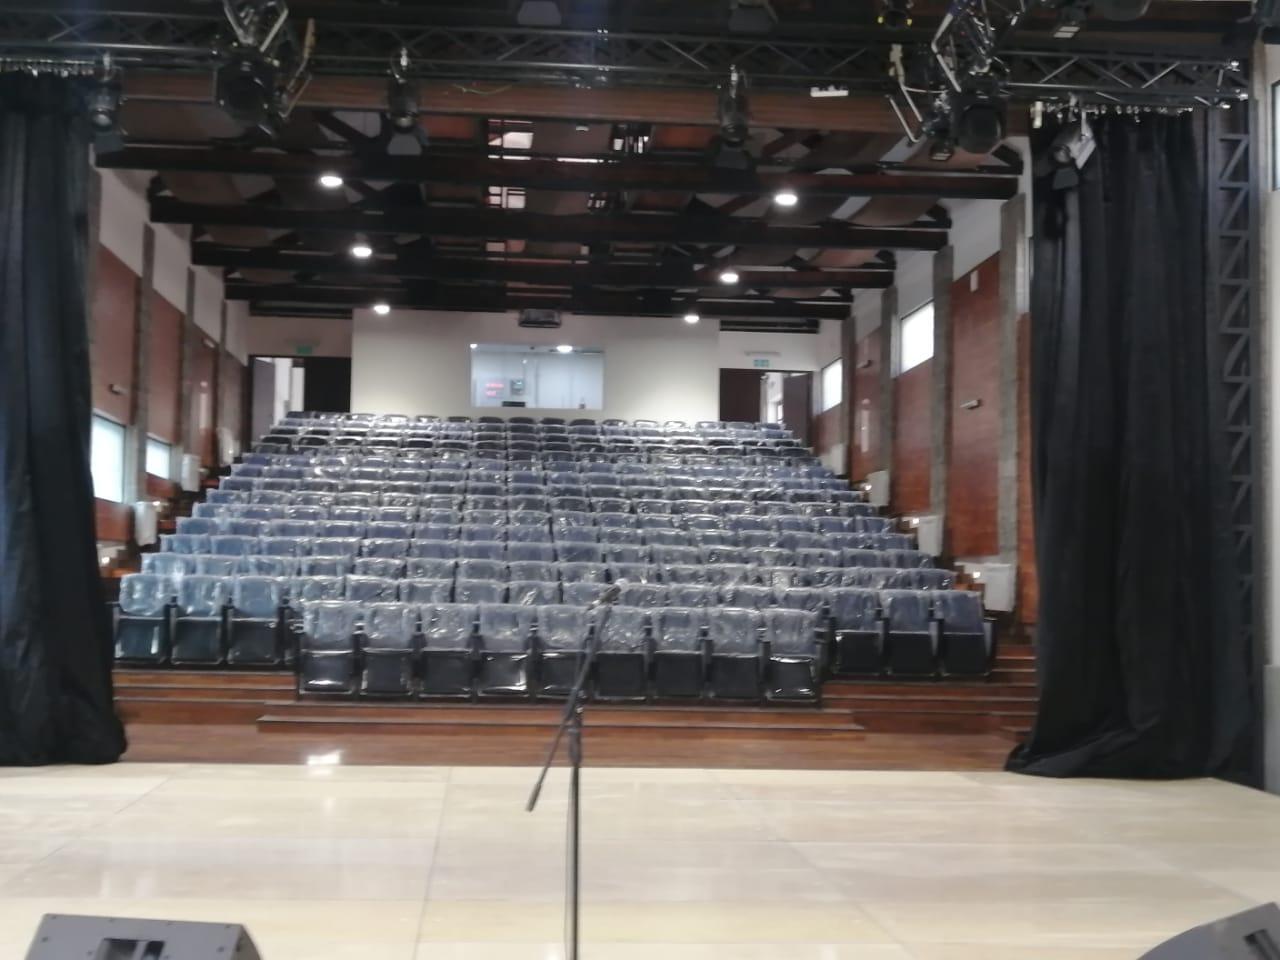 Teatro Galpon